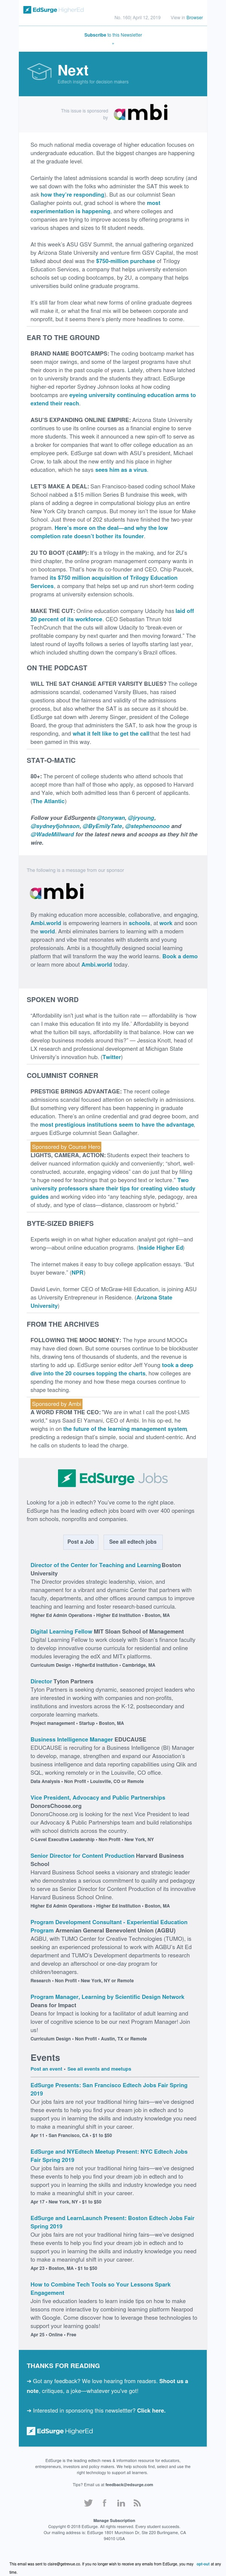 Next 160: ASU's innovation 'virus'; Bootcamps turn to university extension programs